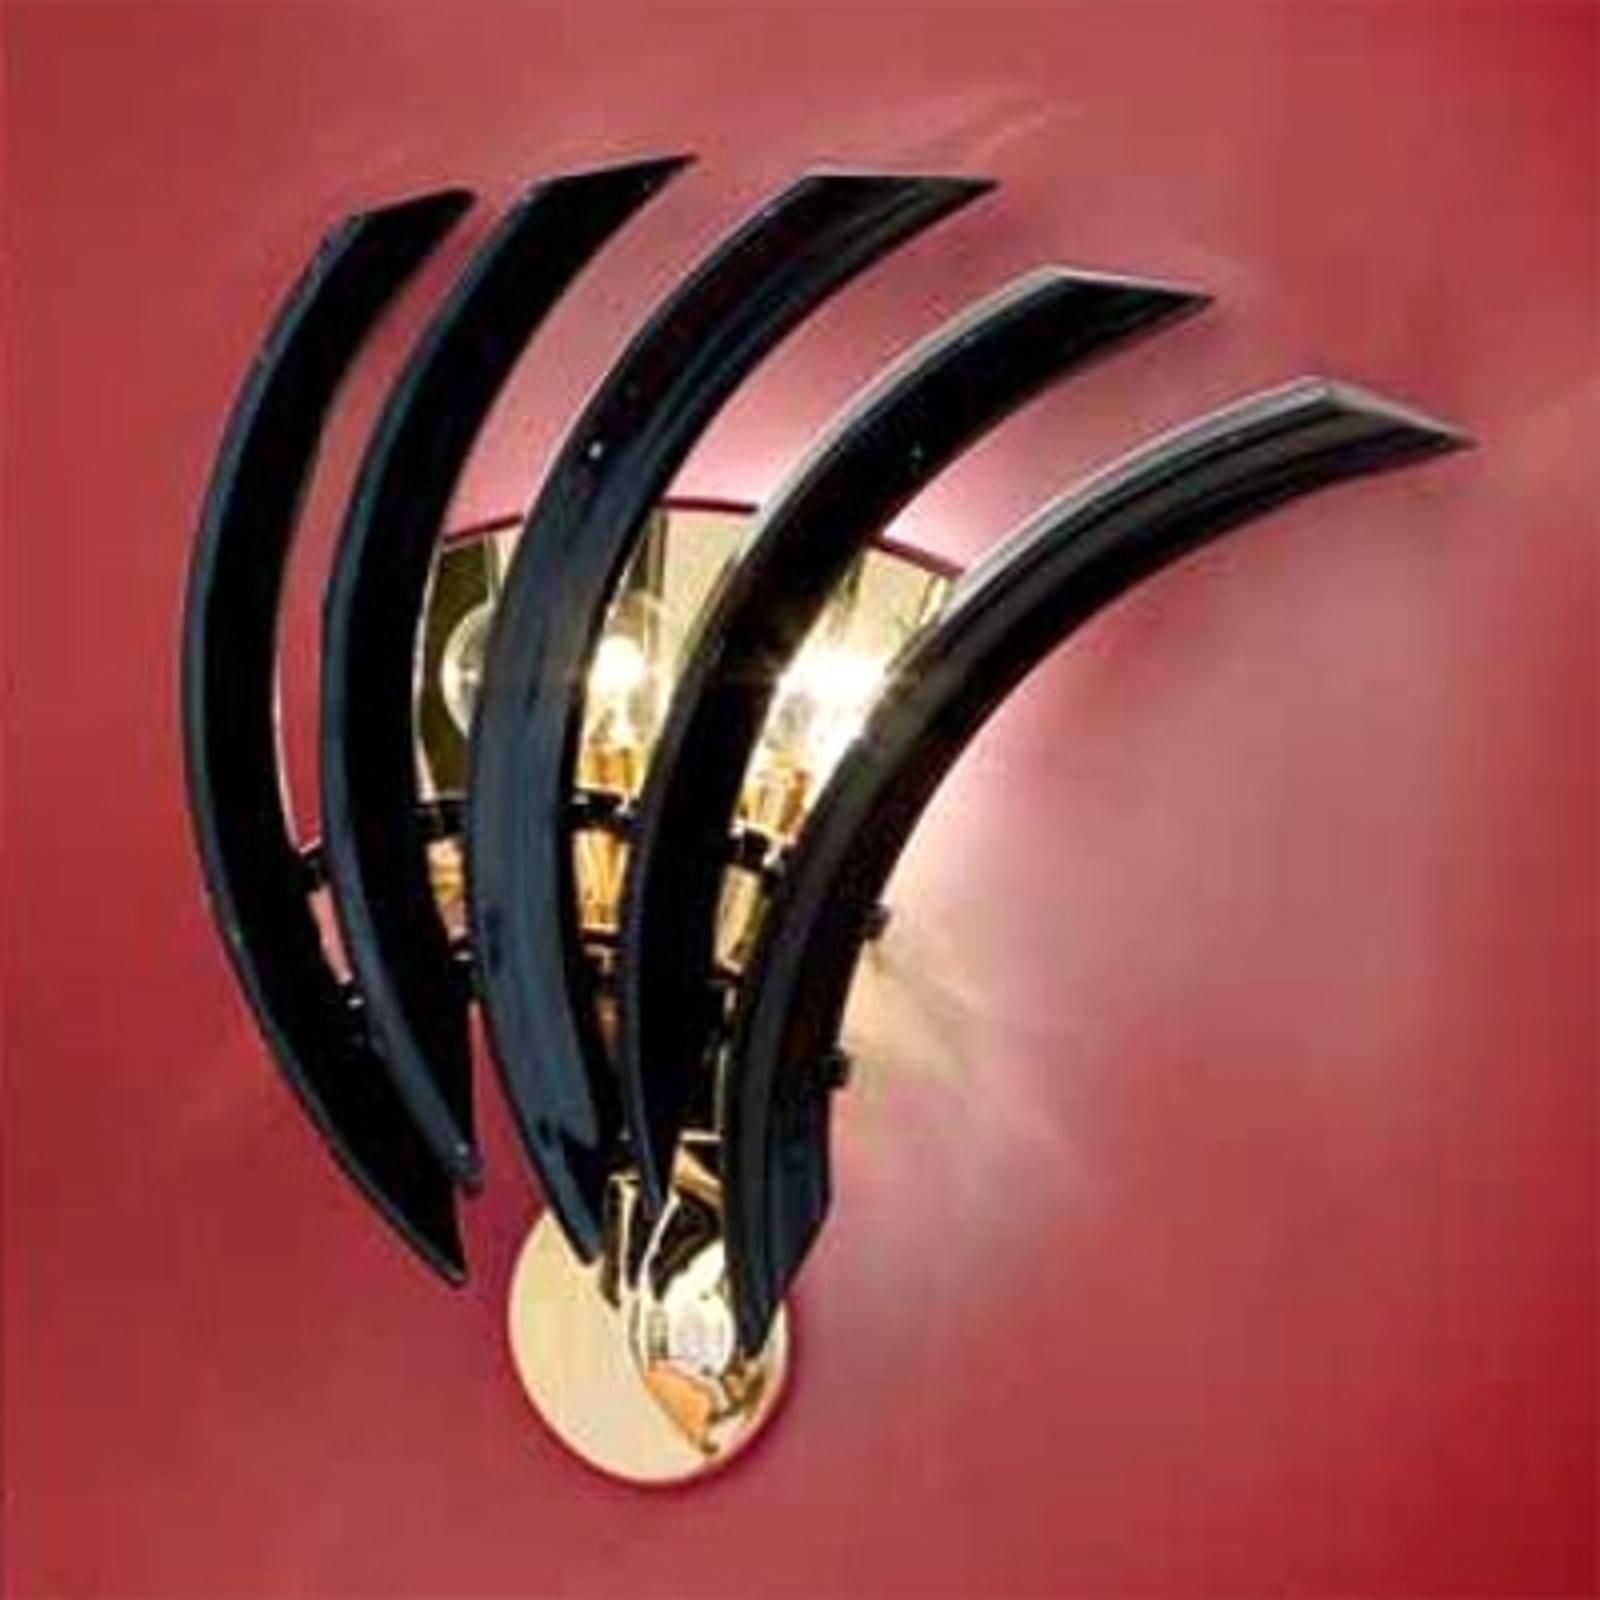 Zwarte wandlamp RONDO van Muranoglas